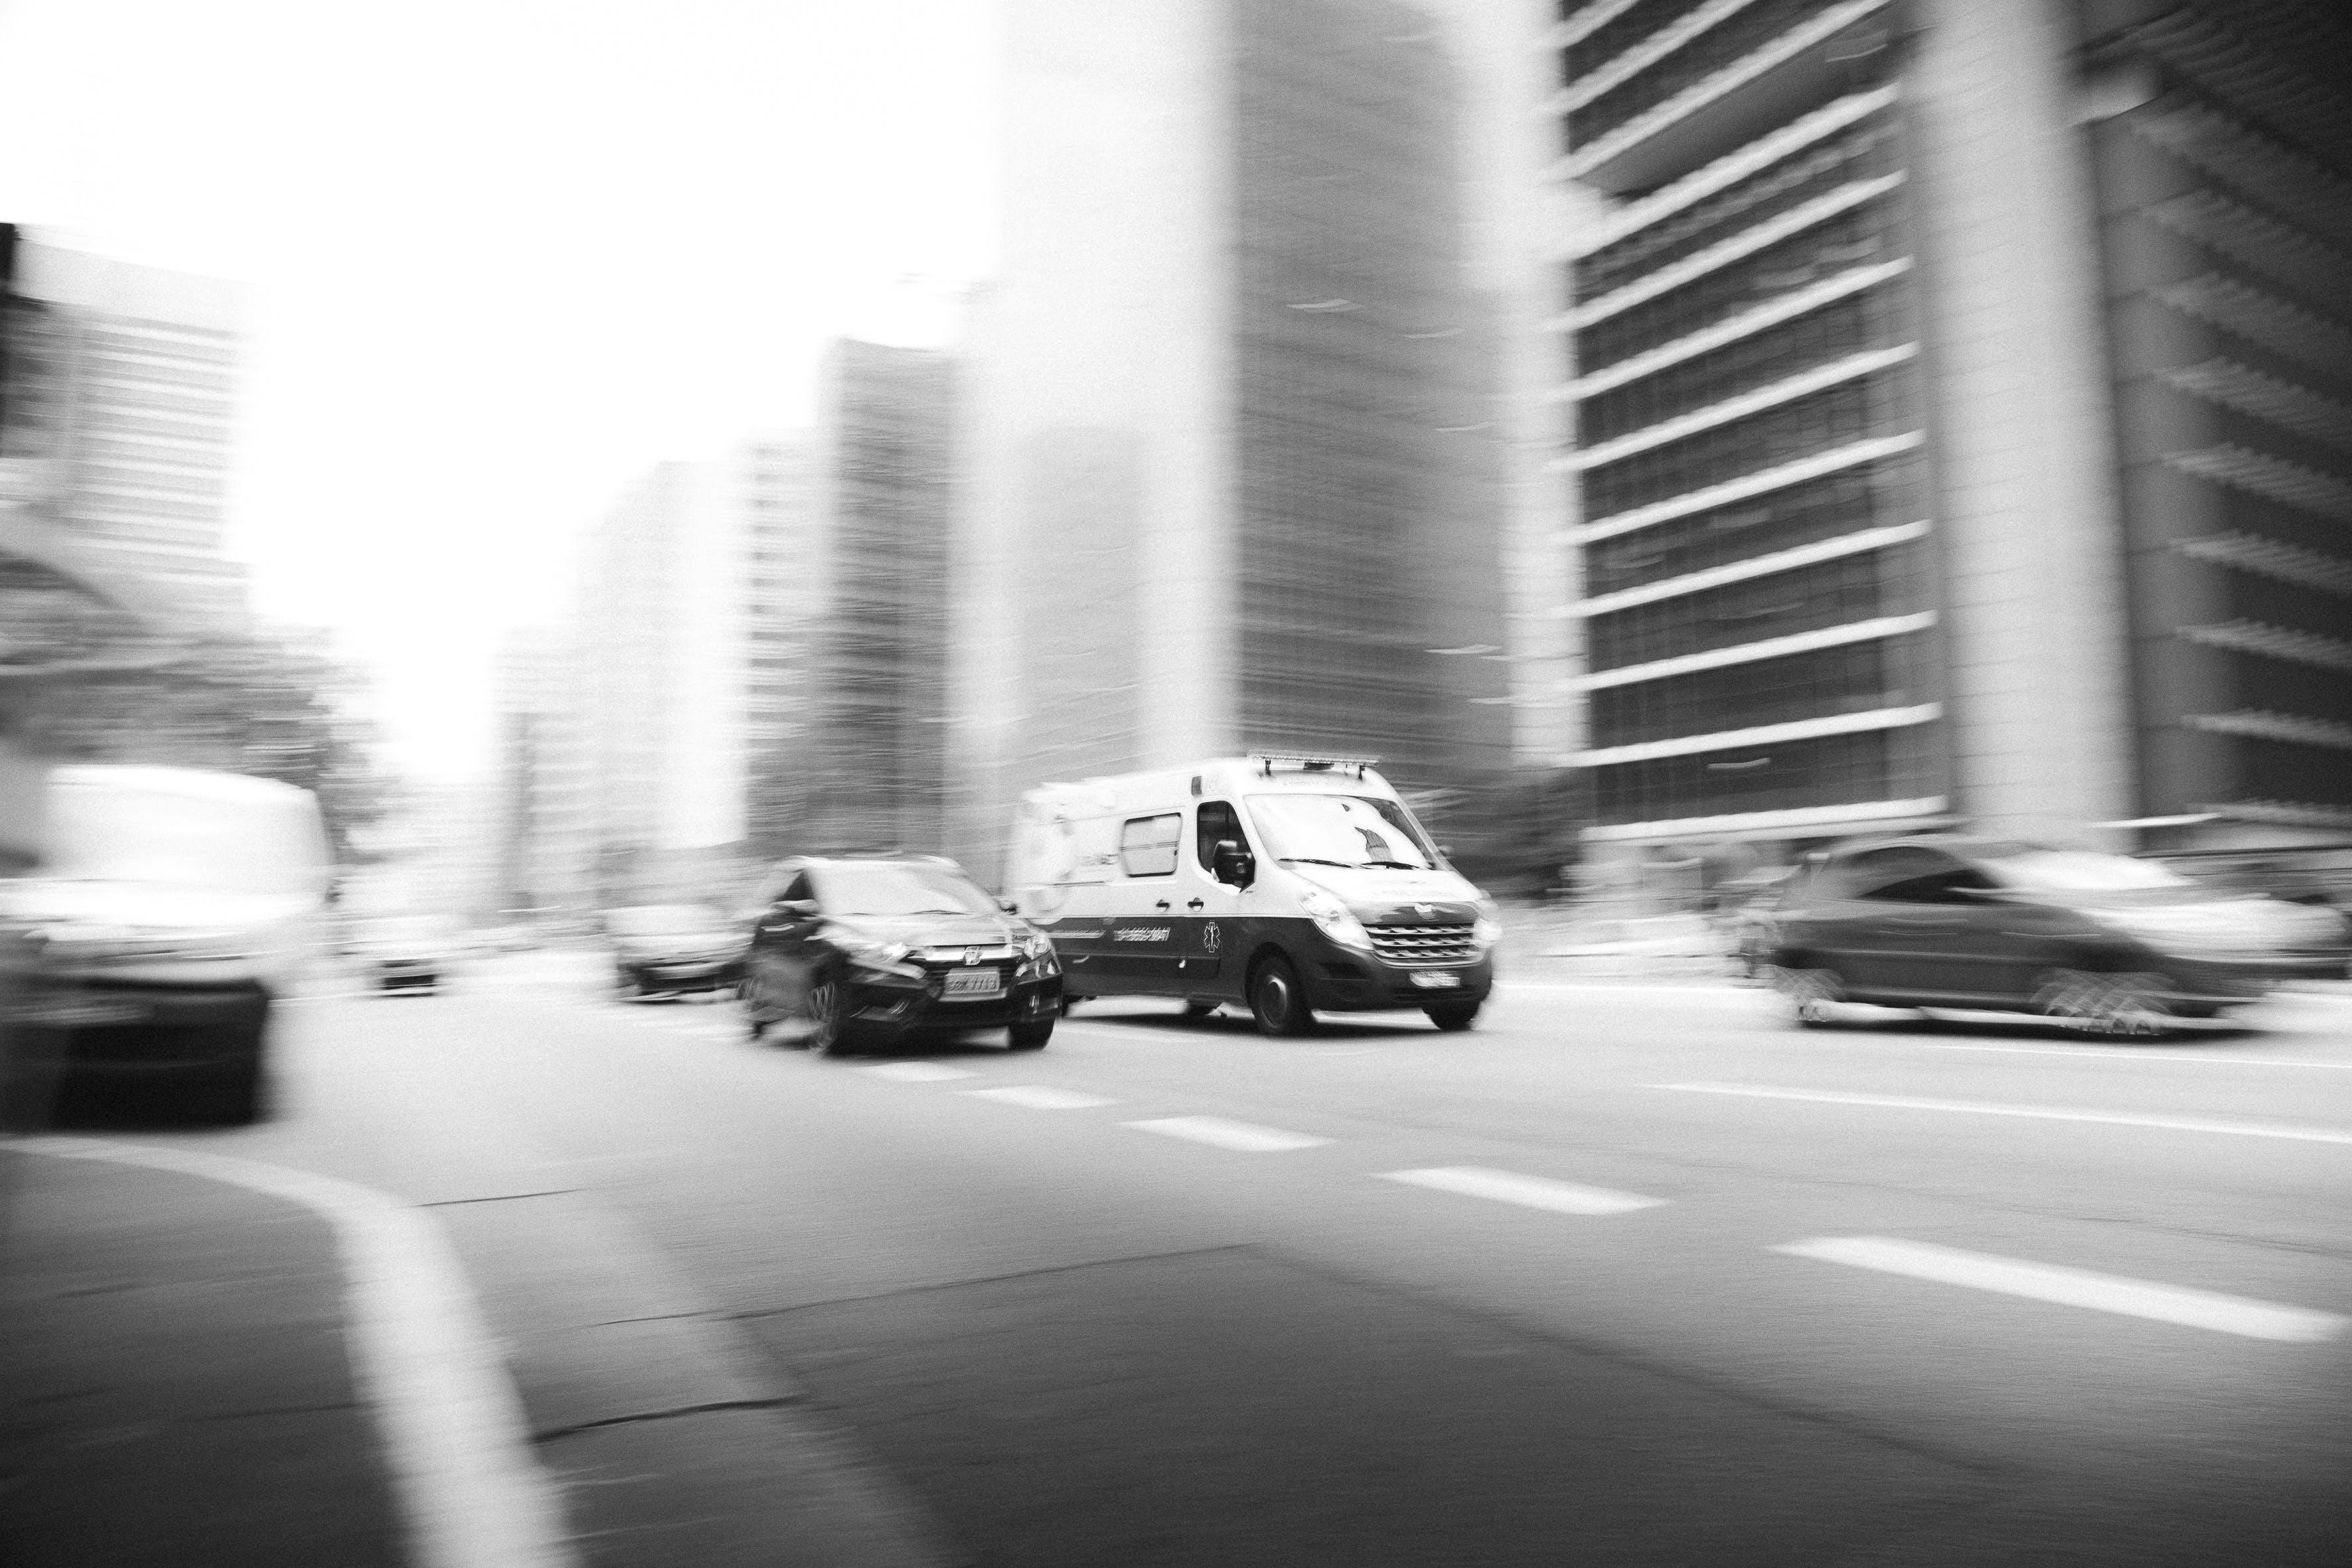 Free stock photo of ambulance, car, panning